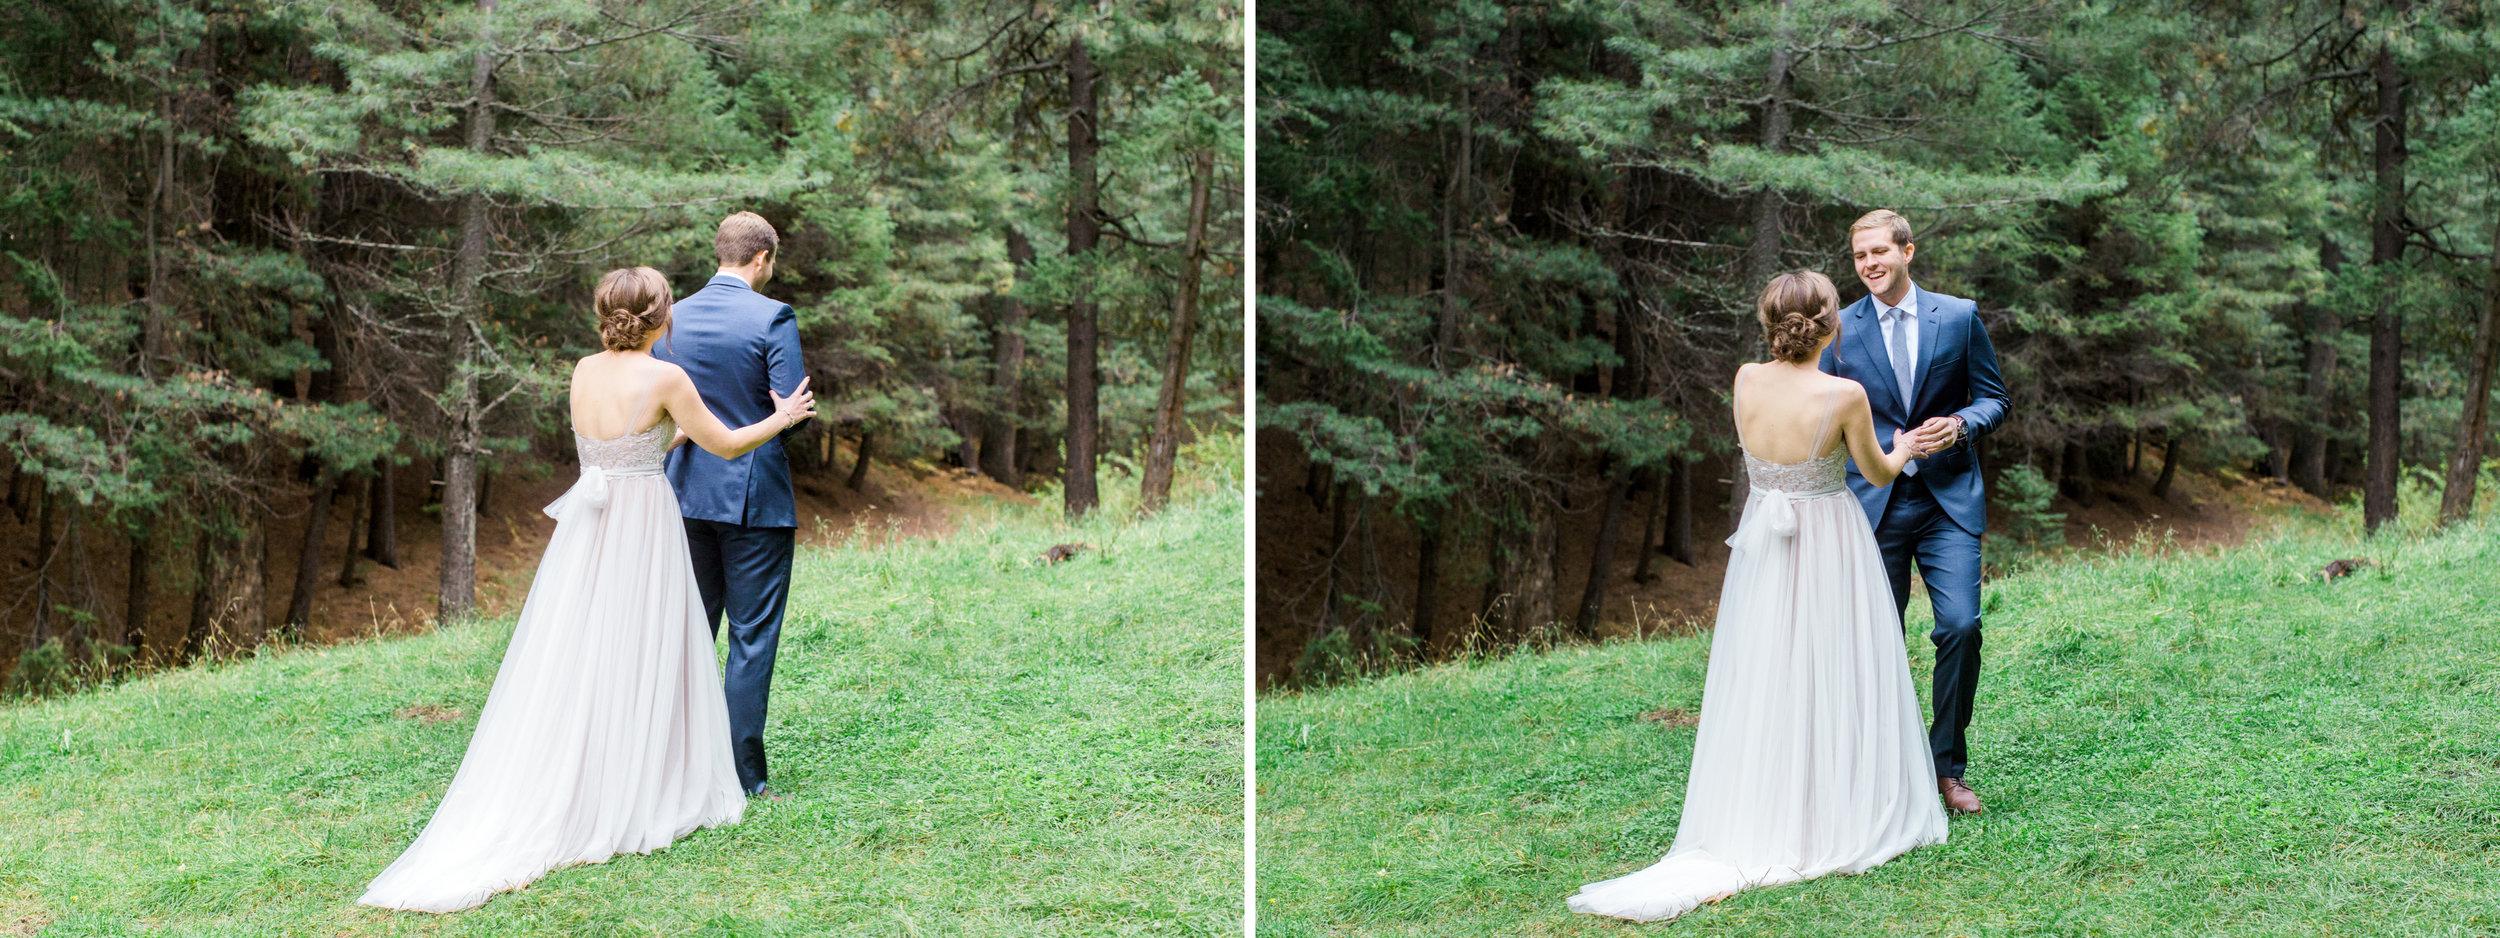 Our Wedding Post_027.JPG